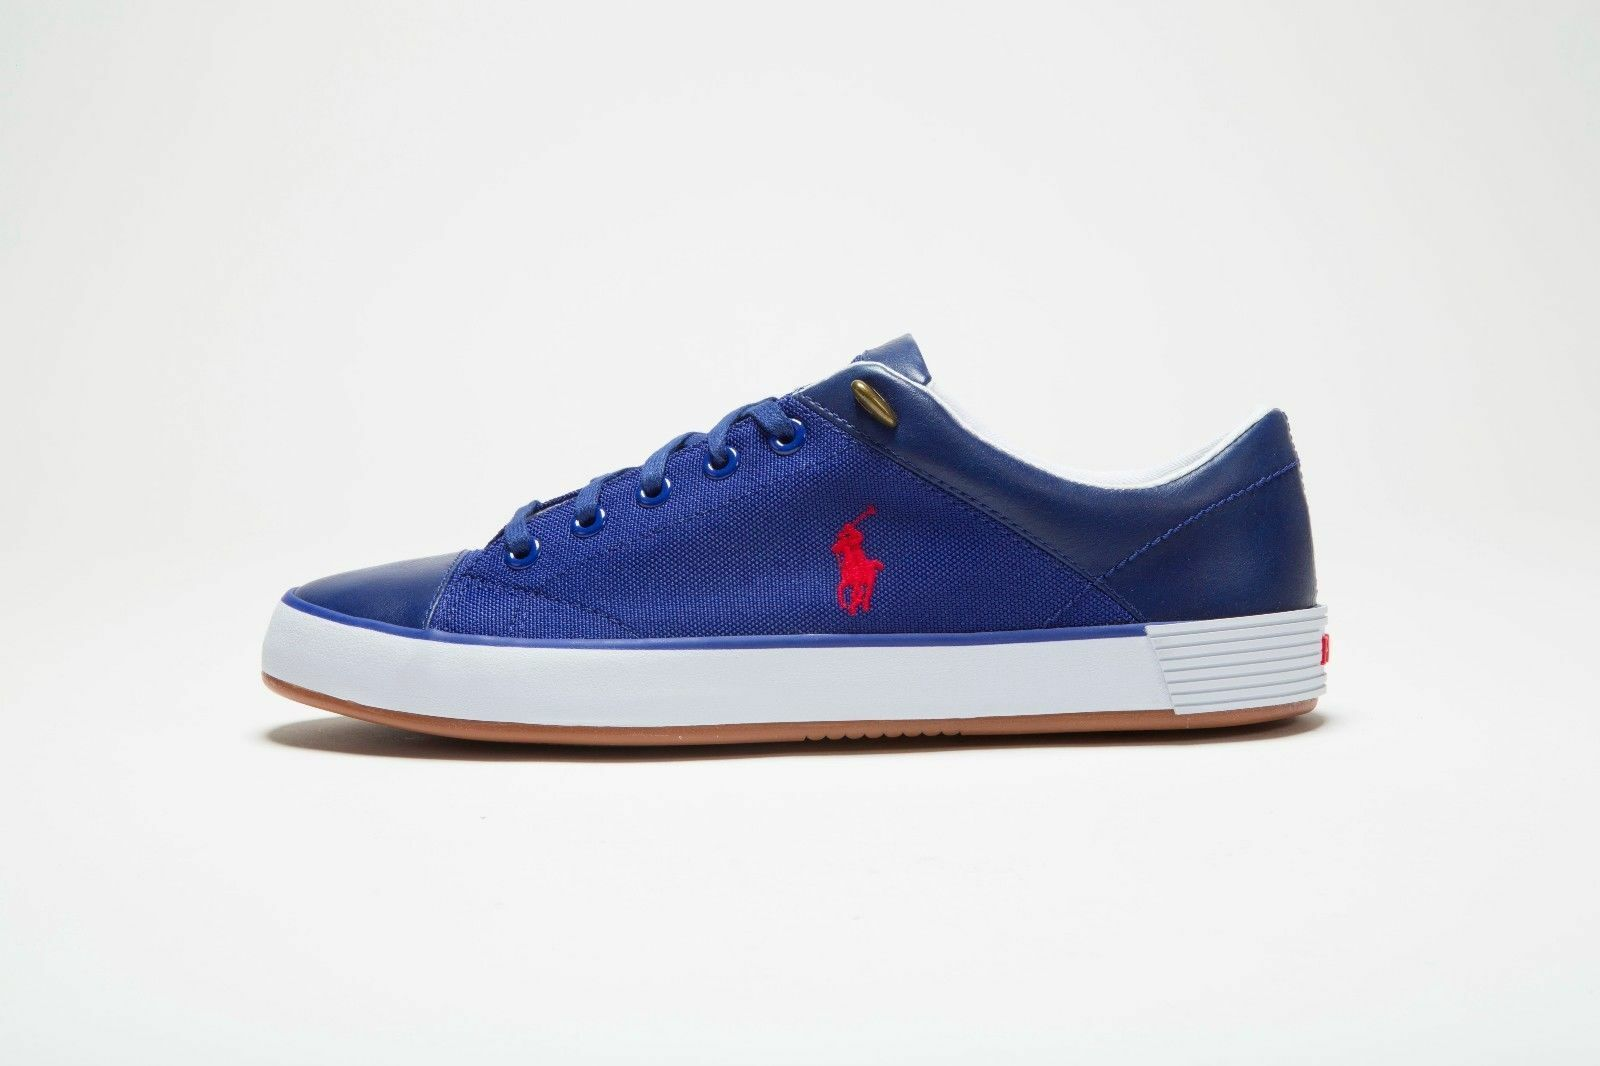 Ralph Lauren Polo Jerom Canvas Heritage Royal bluee Trainers Cordura  Worldwide